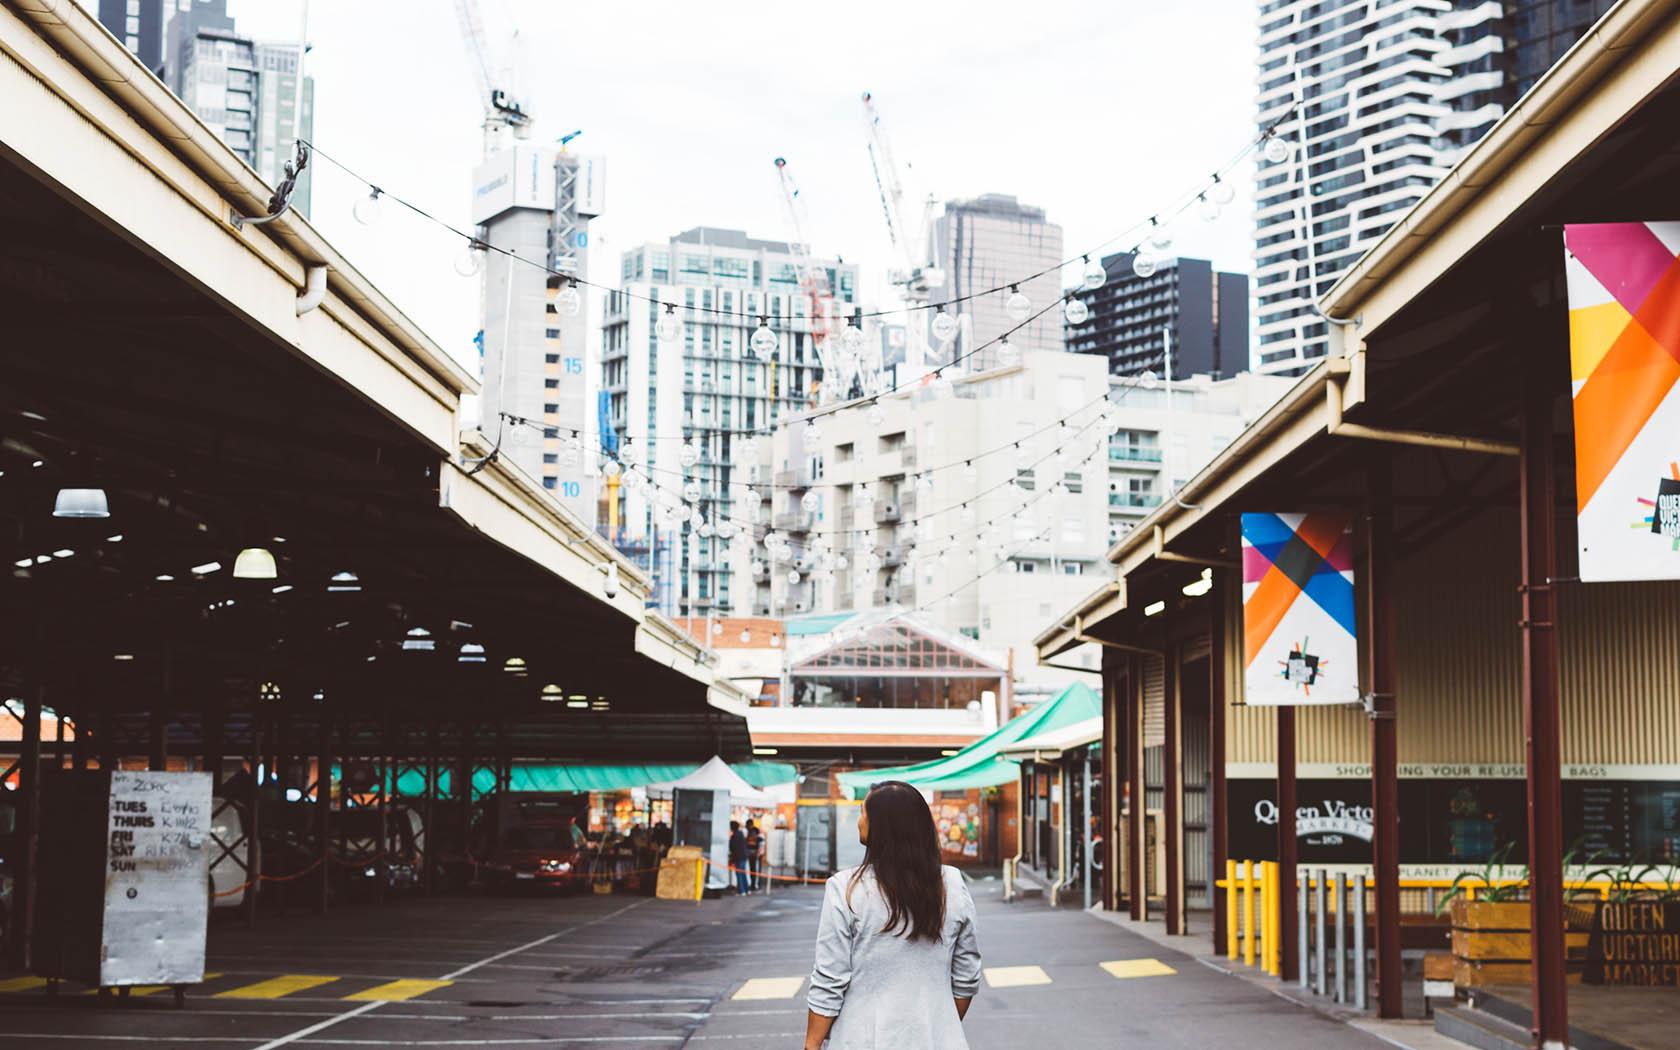 7 Of The Best Weekend Markets In Melbourne, Australia